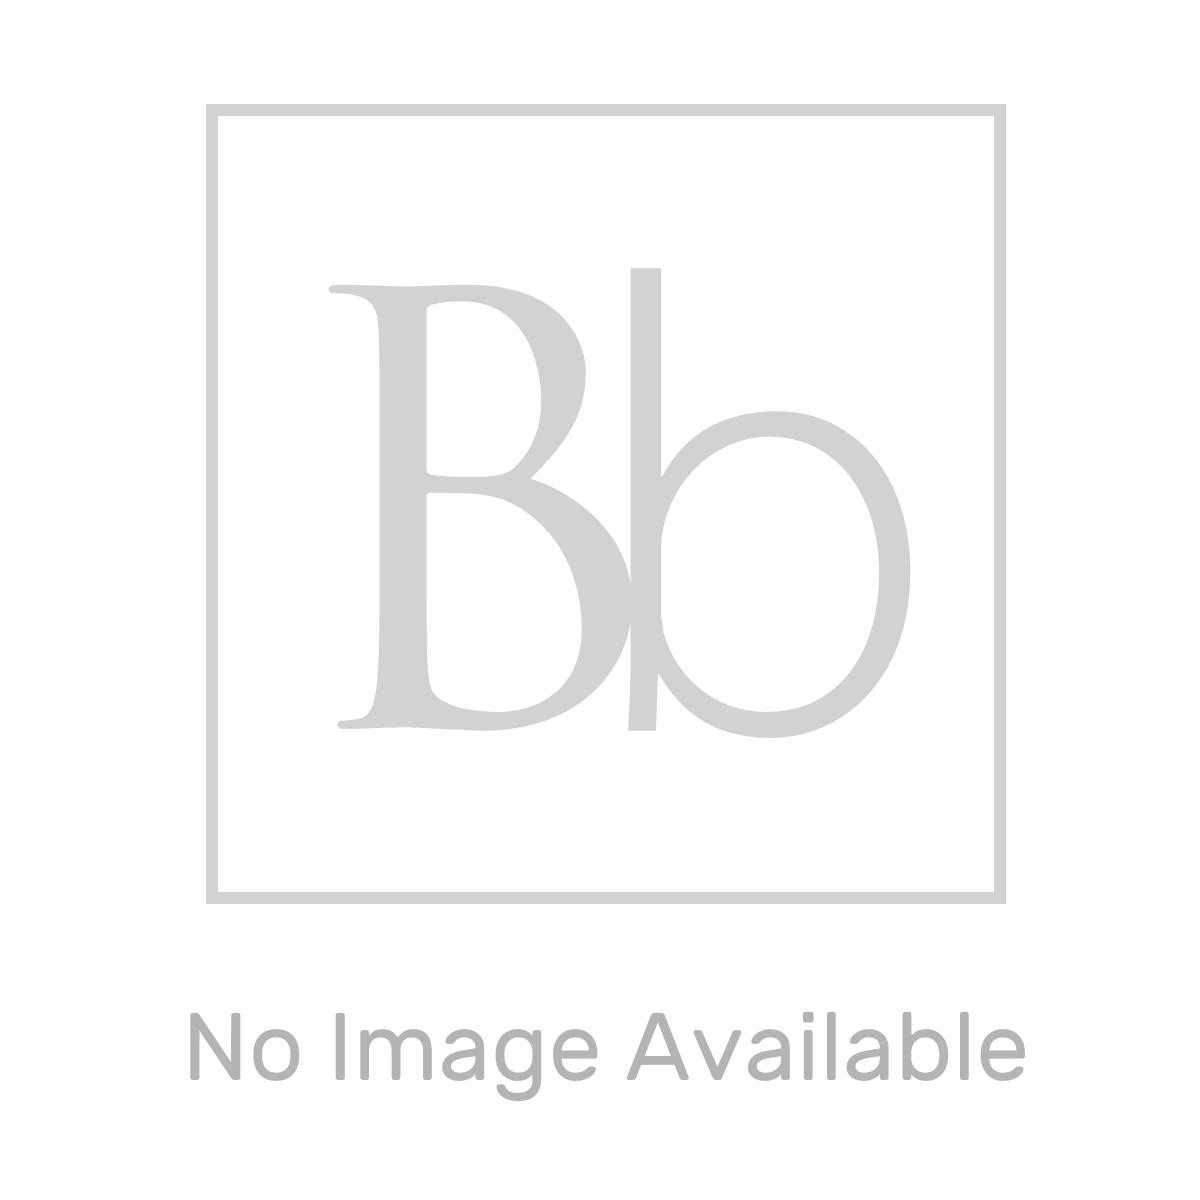 RAK Series 600 Back To Wall Toilet and 500 Series Gloss White Mini Double Door Vanity Unit